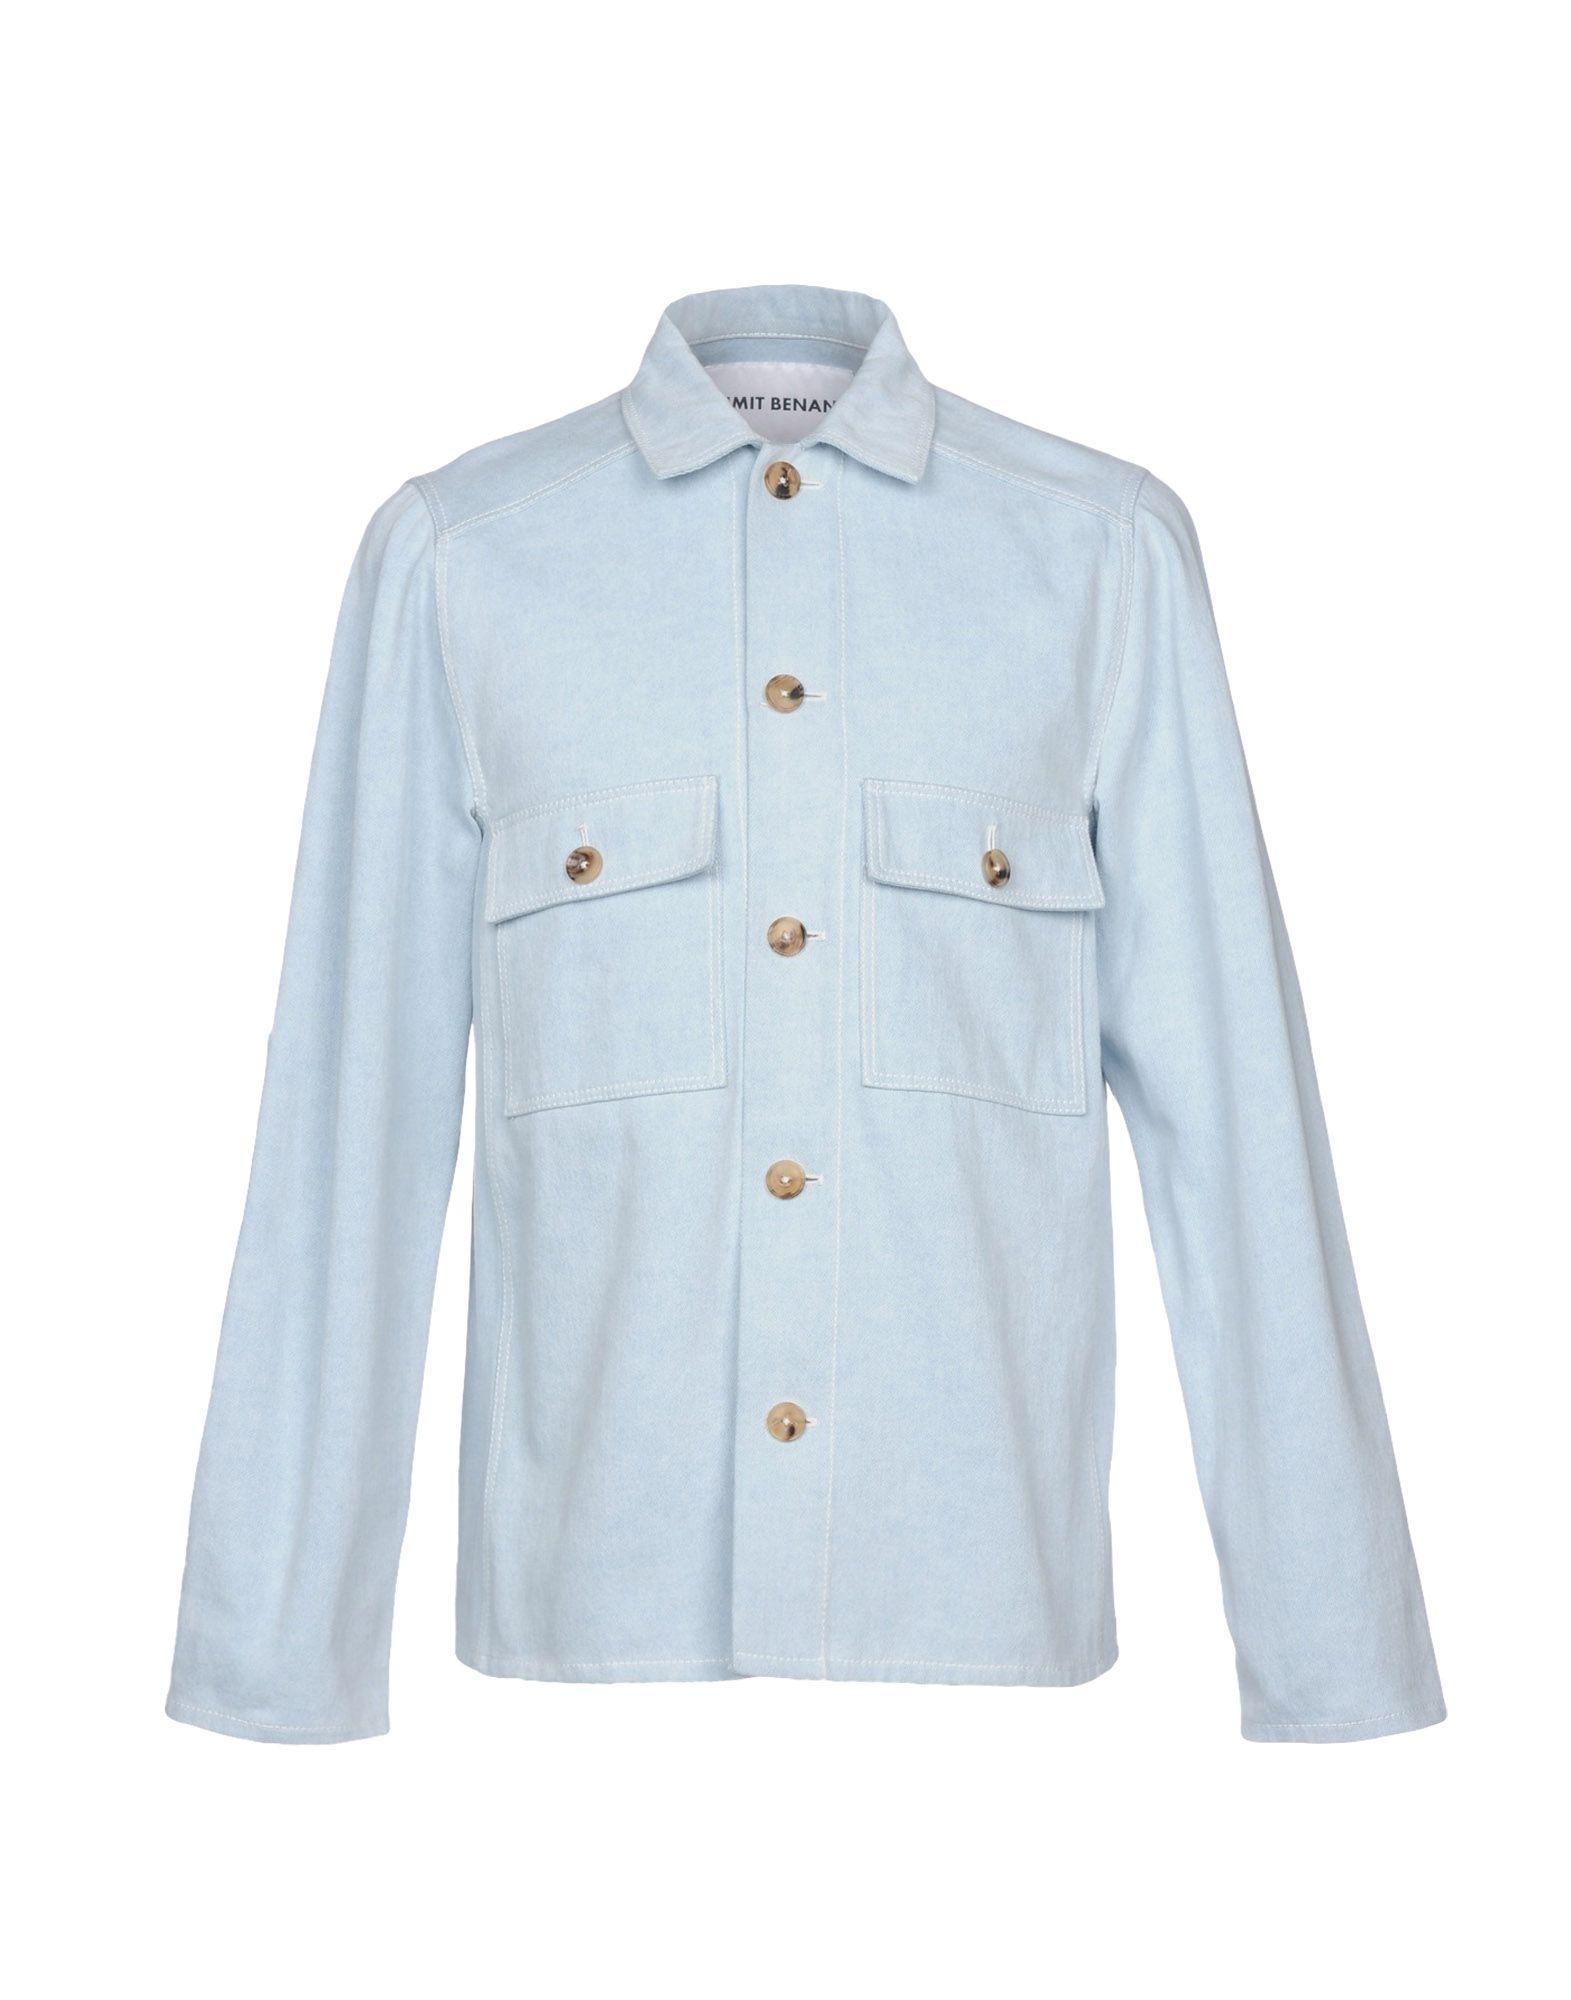 Camicia Jeans Umit Benan Uomo - Acquista online su